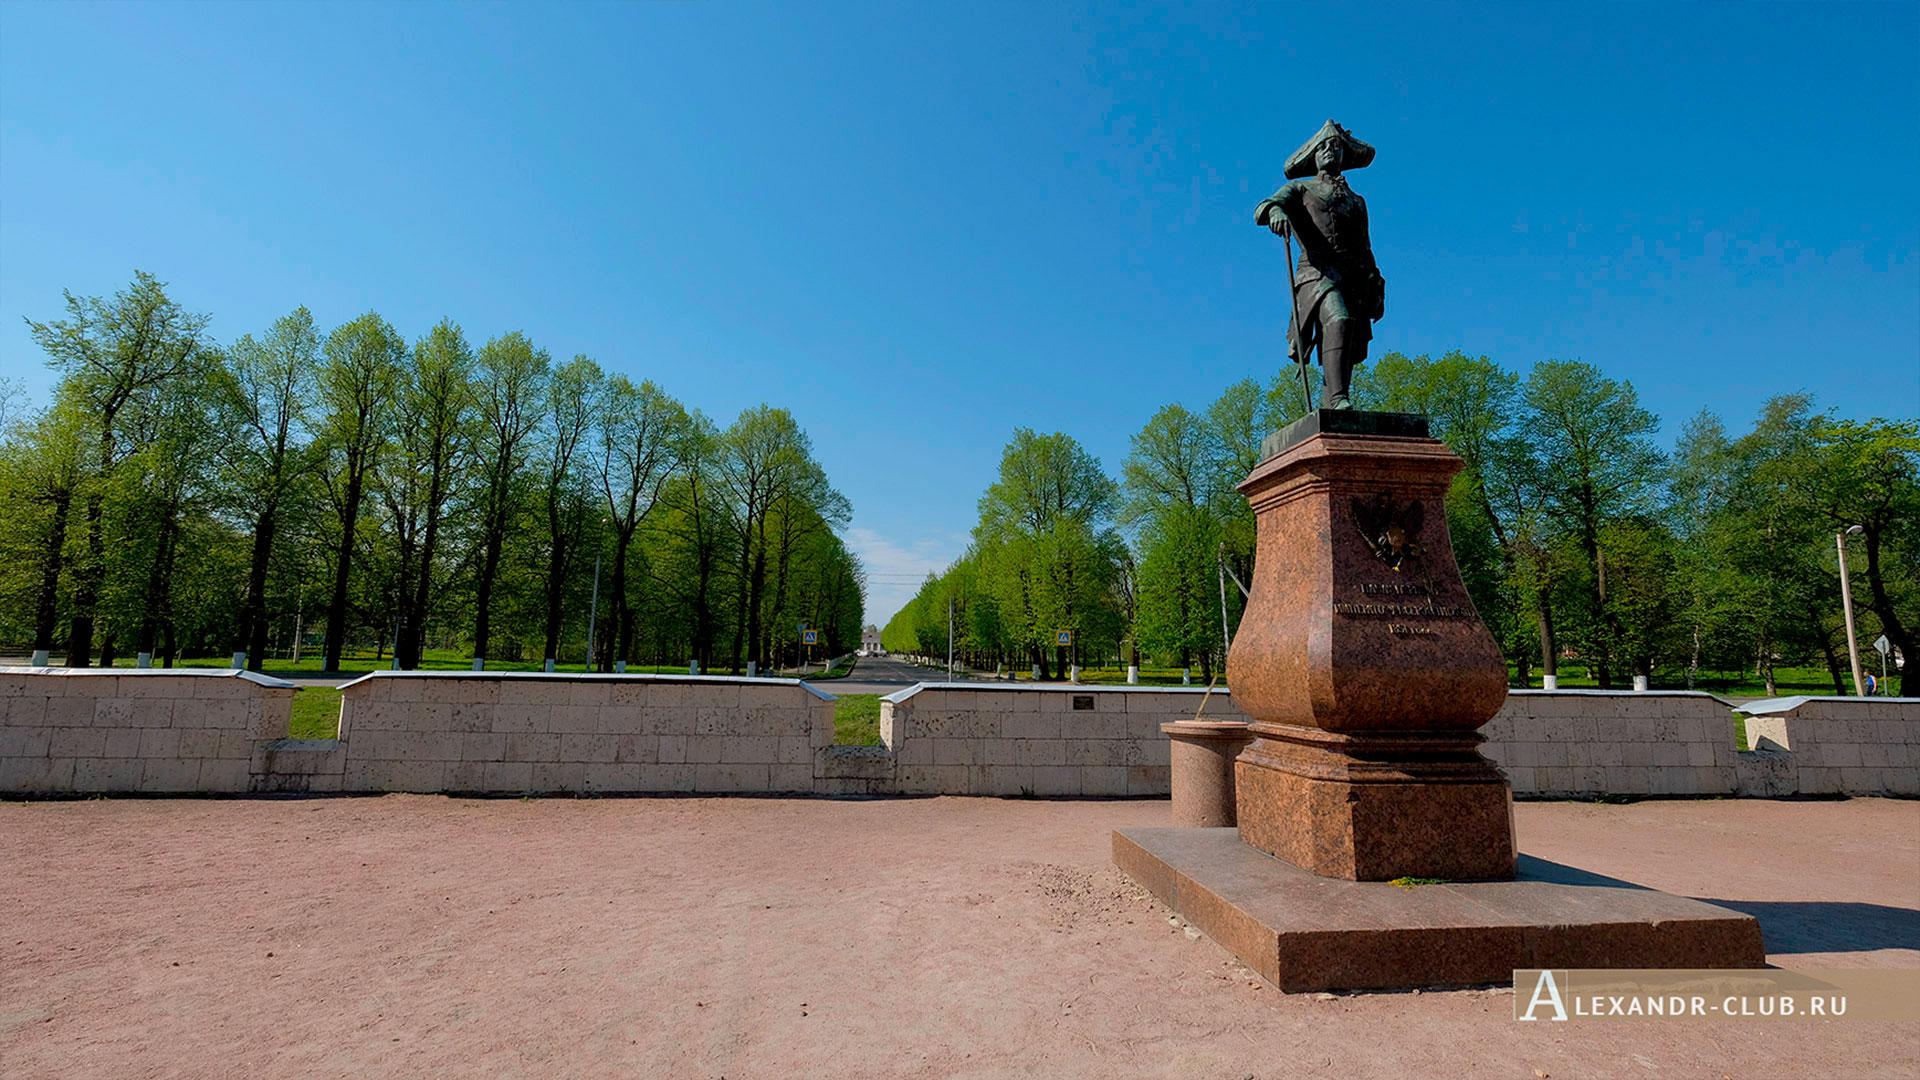 Гатчина, весна, Памятник Павлу I